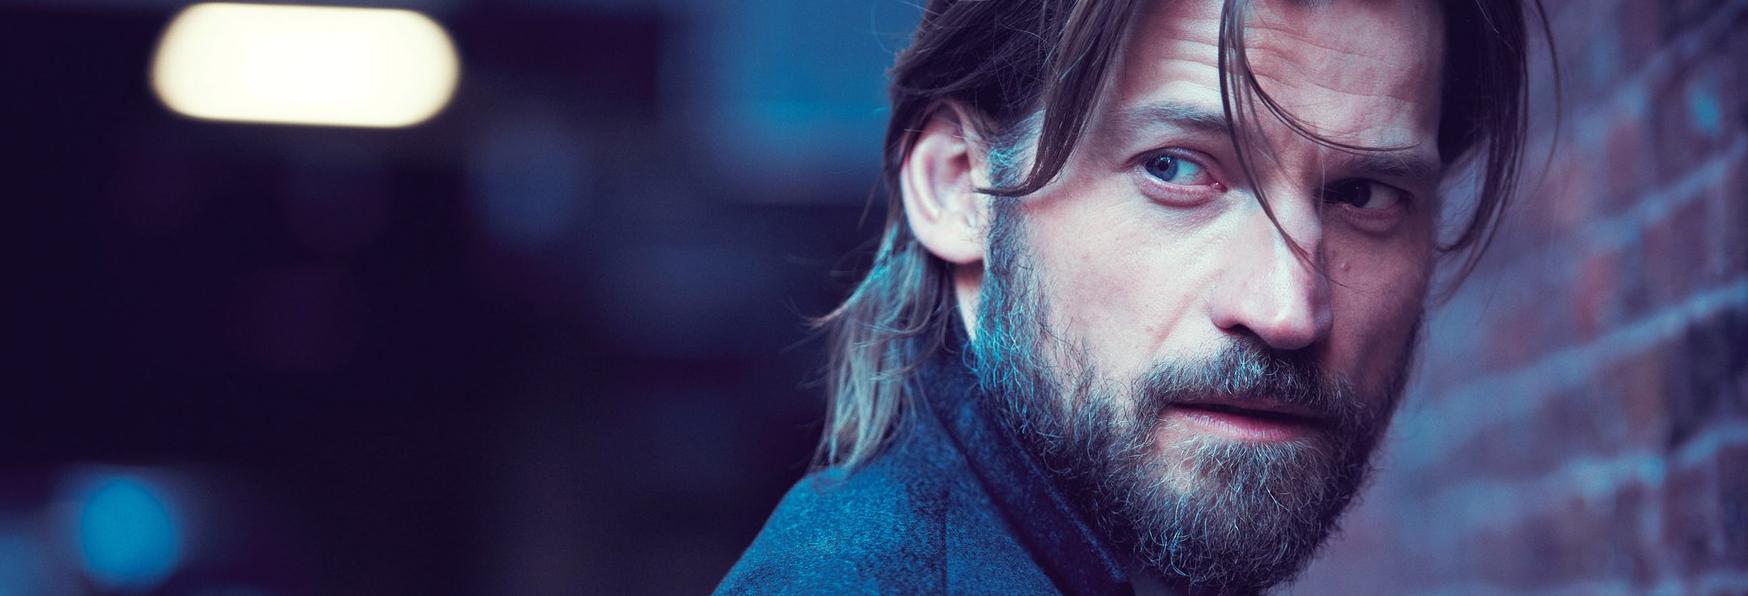 Nikolaj Coster-Waldau di Game of Thrones protagonista nel Pilot di Gone Hollywood